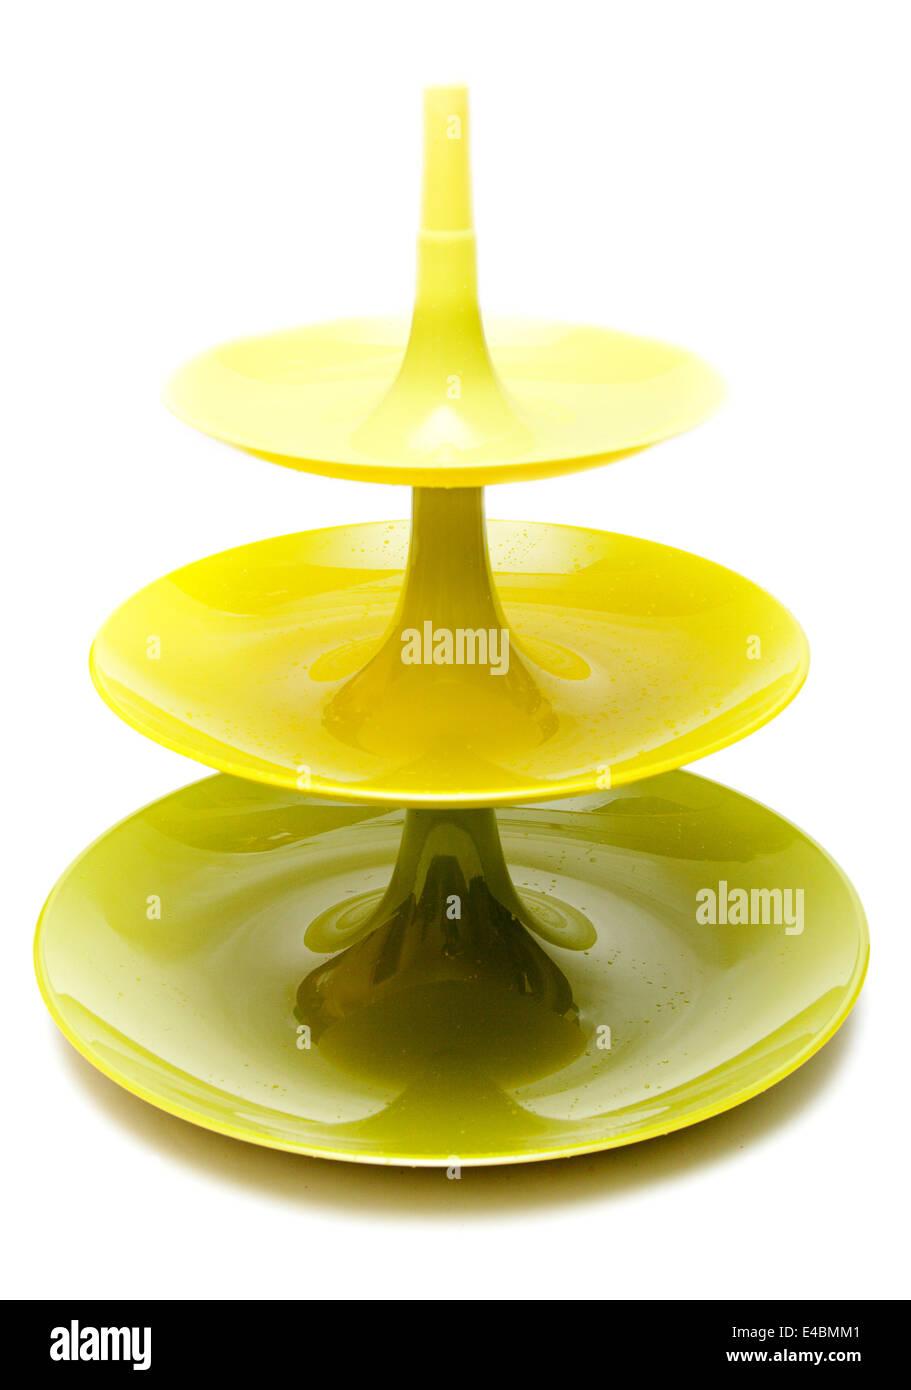 Three-story plastic green vase - Stock Image